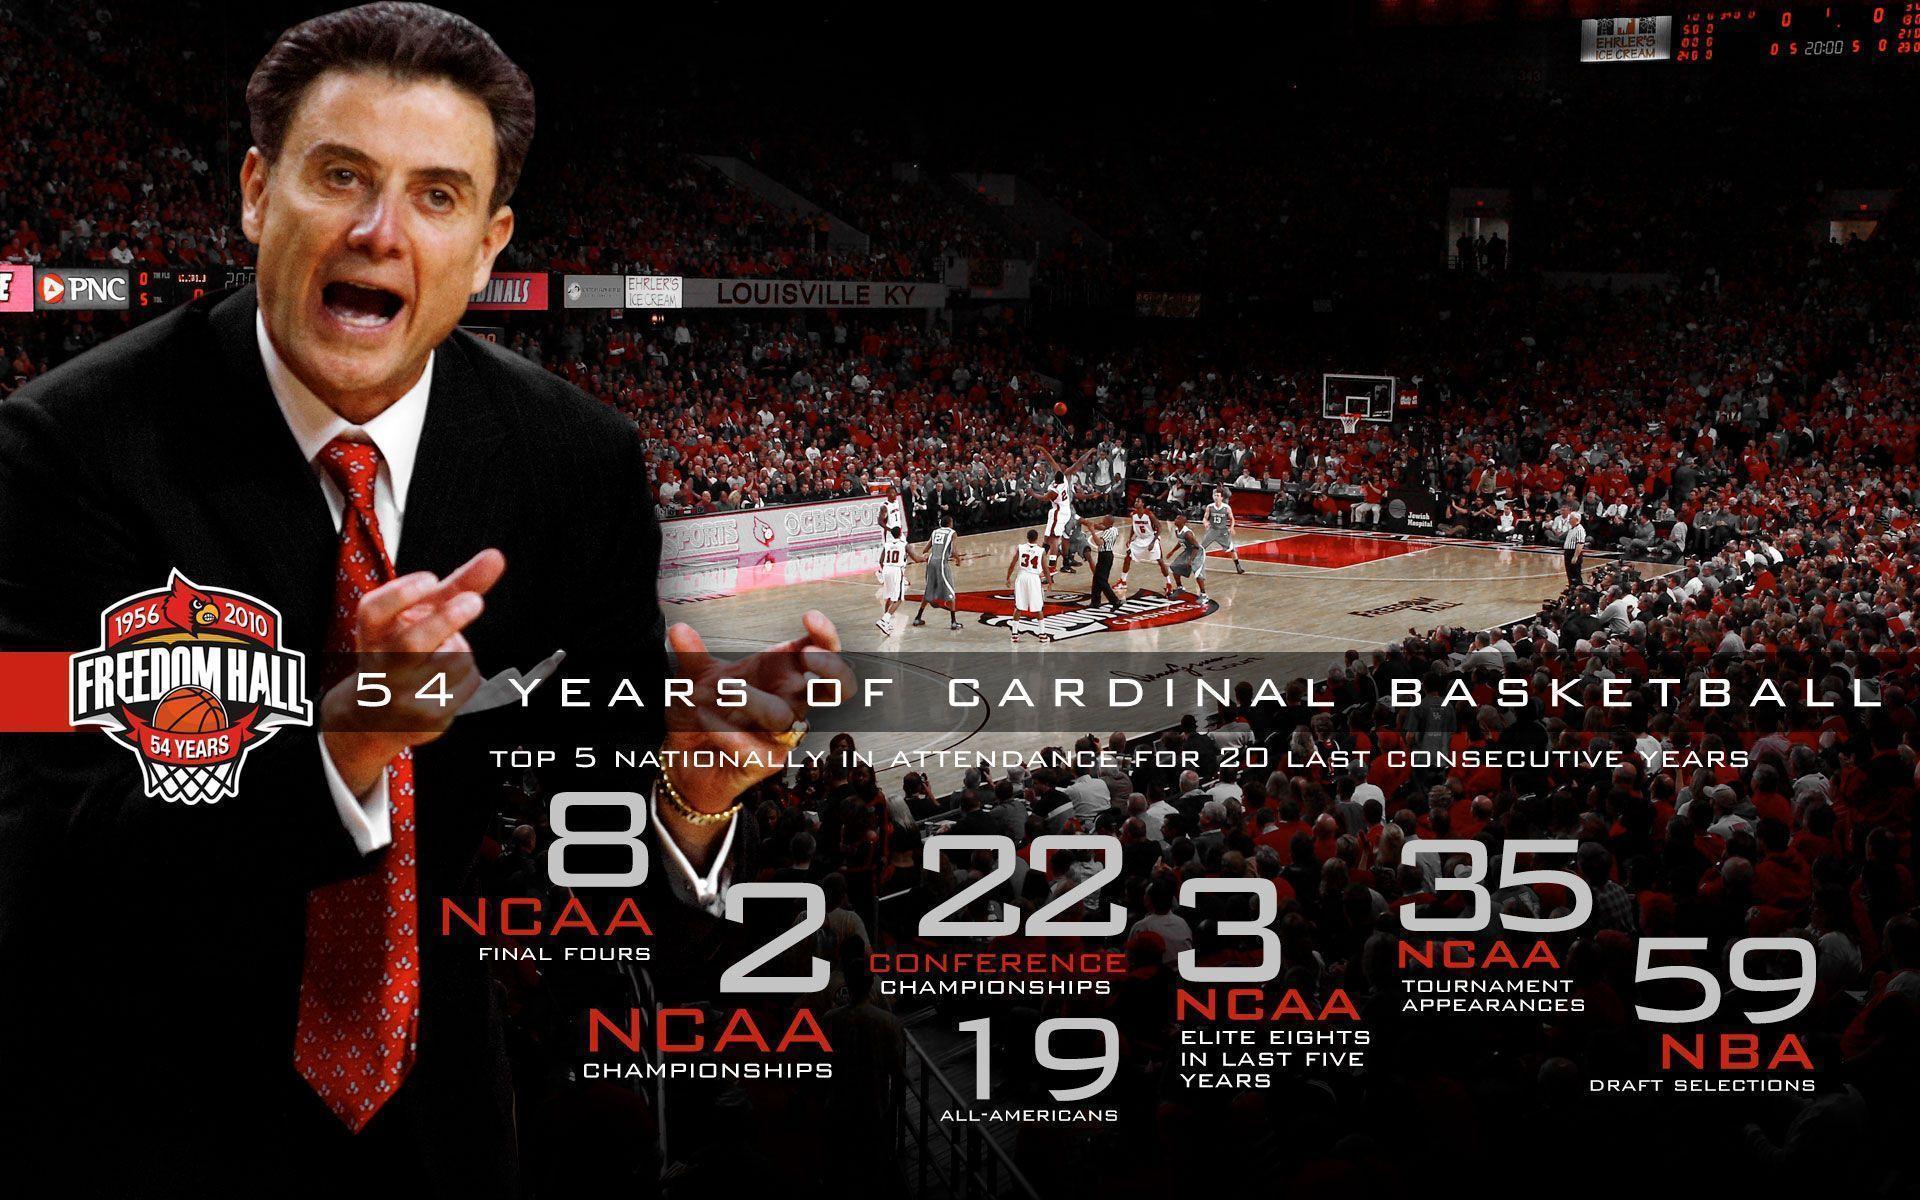 UofL Basketball Logo Wallpaper 640×960 University Of Louisville .